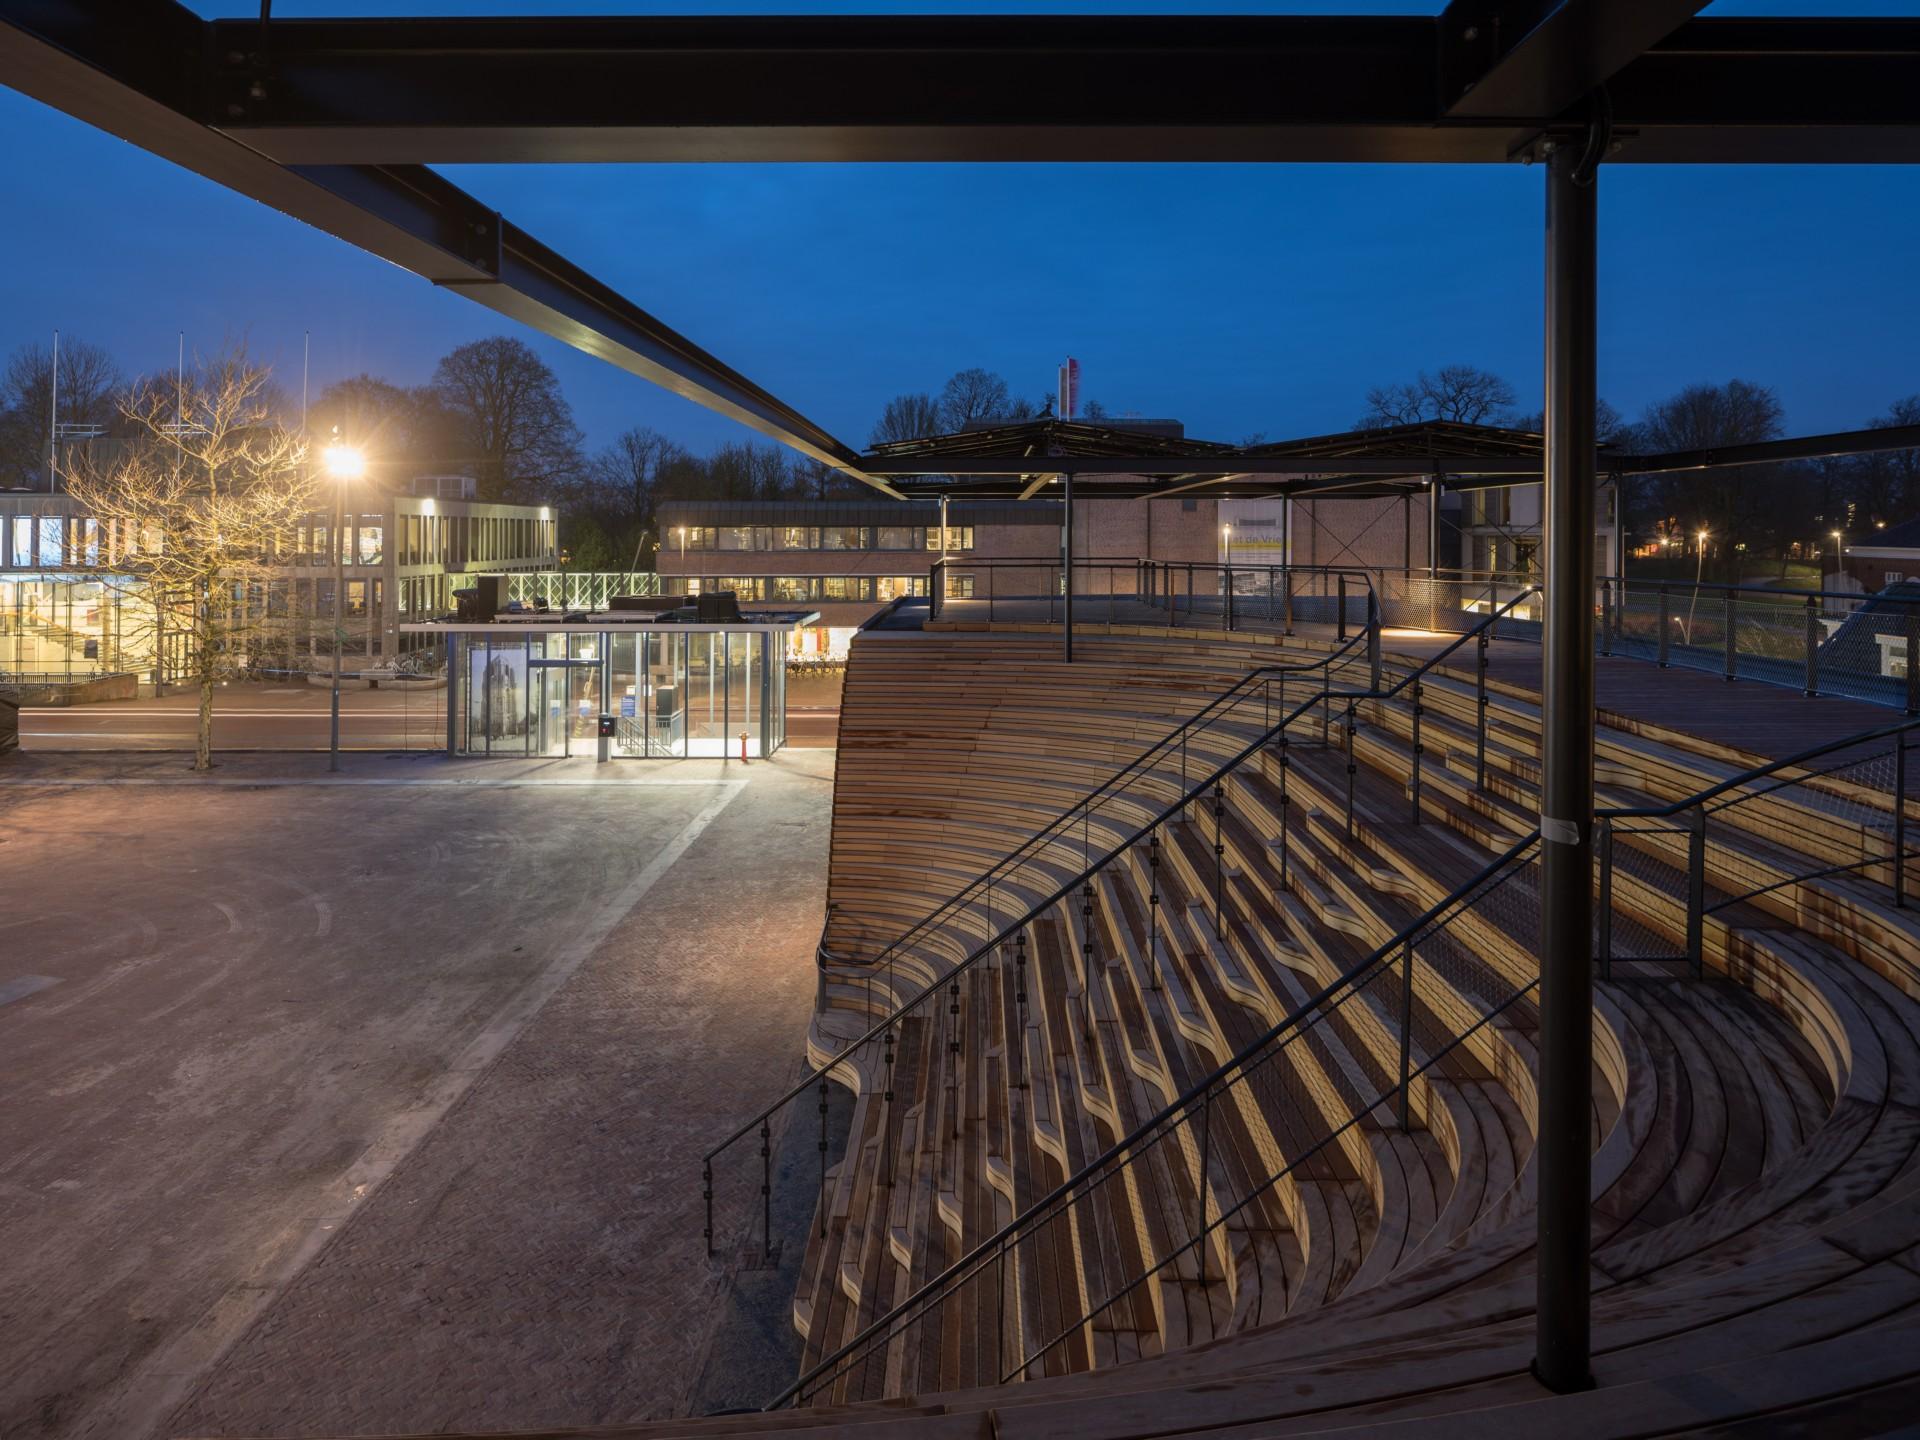 Powerhouse Company Pabellón Obe en Leeuwarden Capital Europea de la Cultura 2018